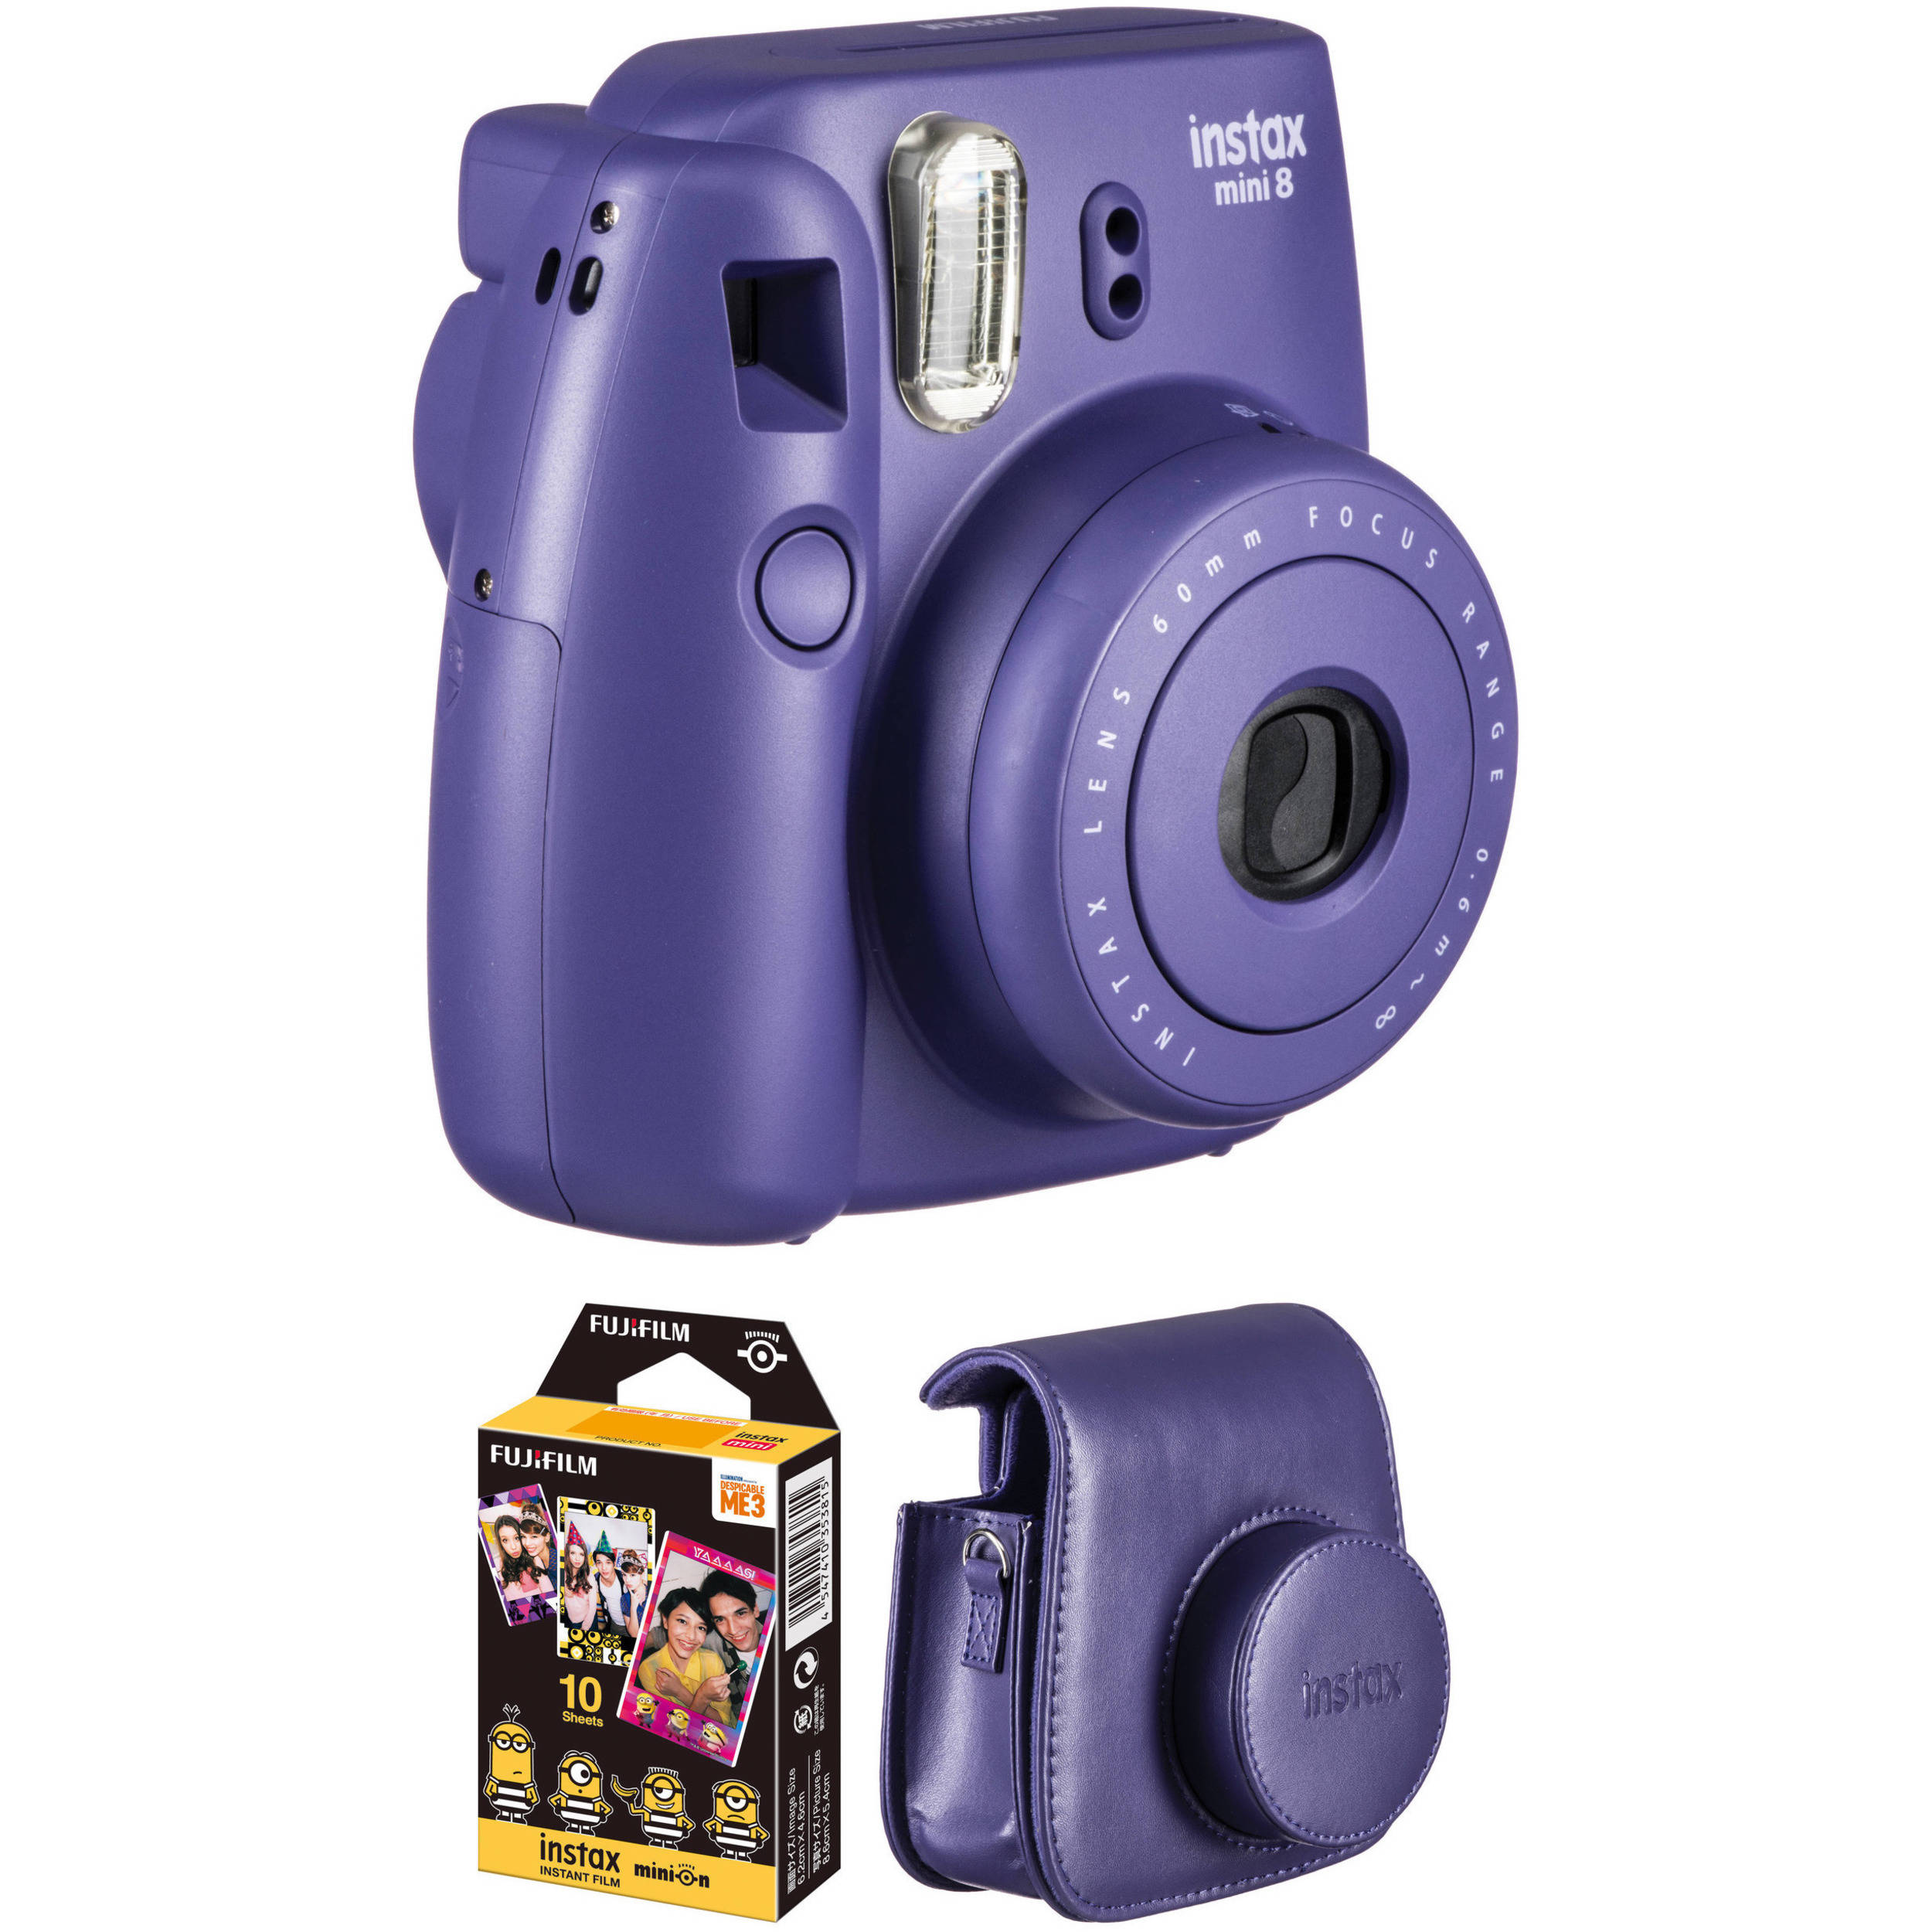 Fujifilm instax mini 8 Instant Film Camera Basic Kit (Grape) B&H